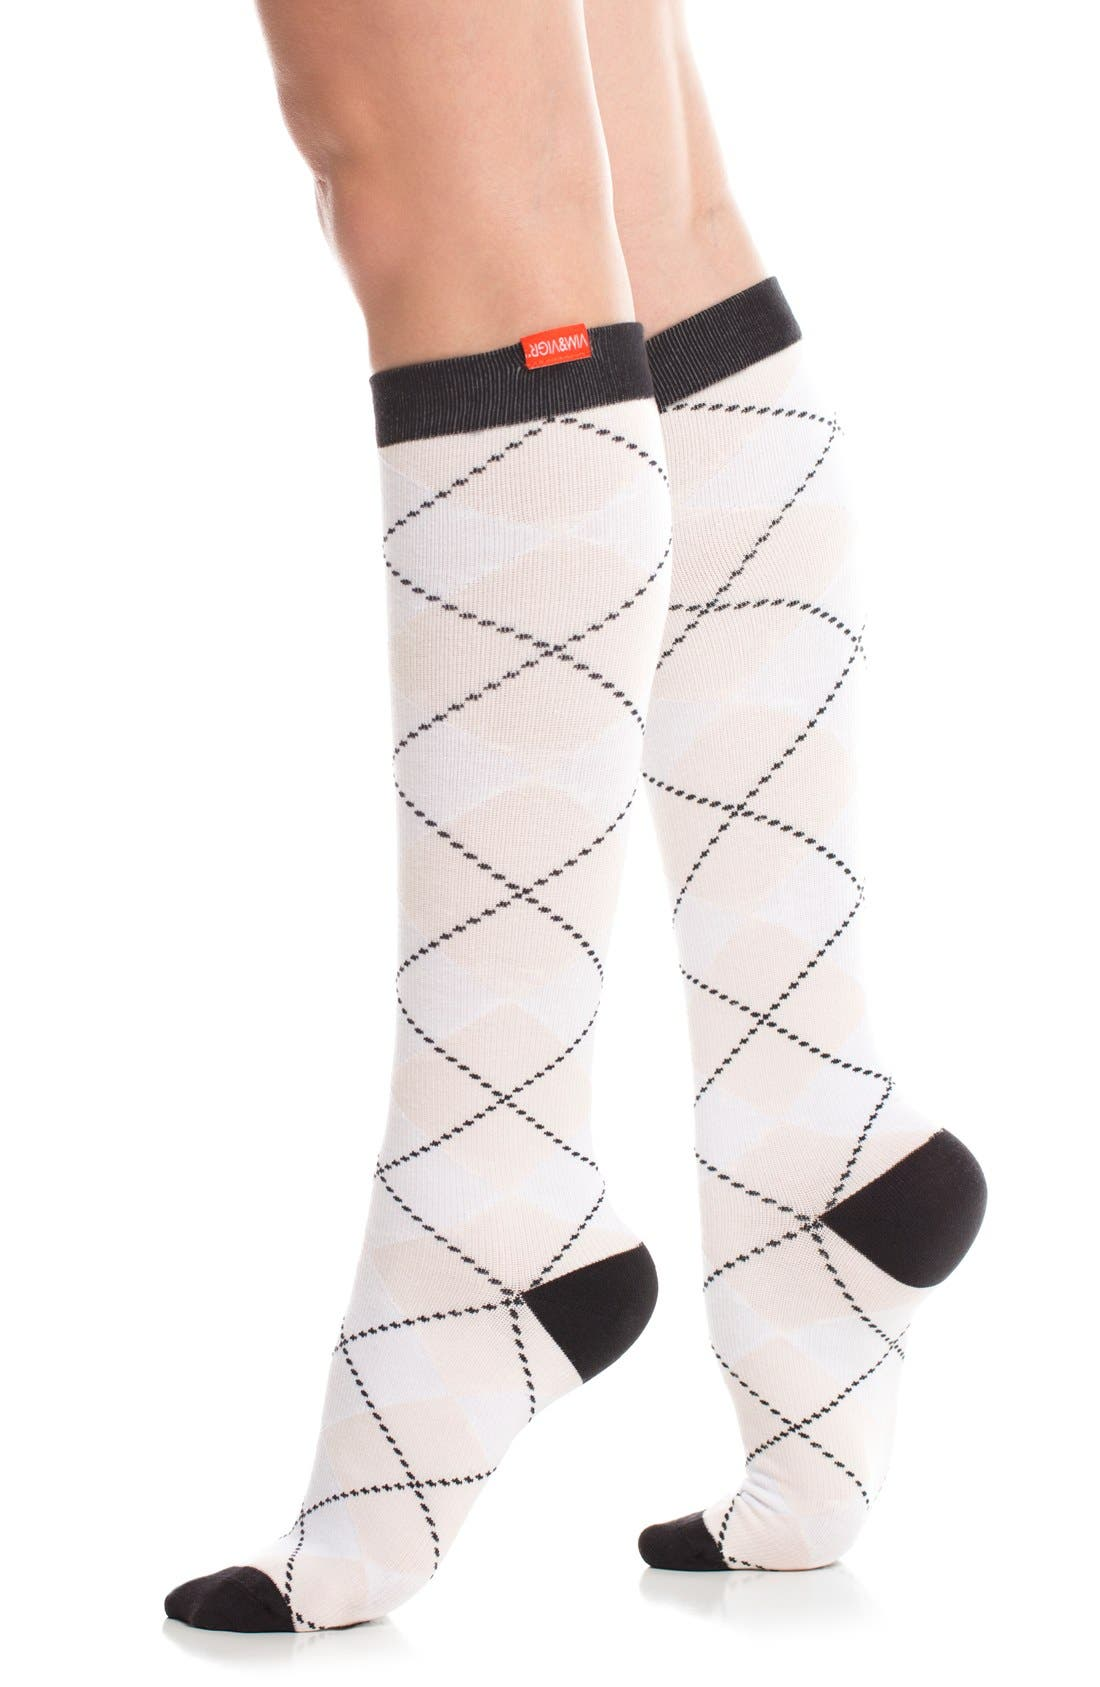 VIM & VIGR Argyle Graduated Compression Trouser Socks